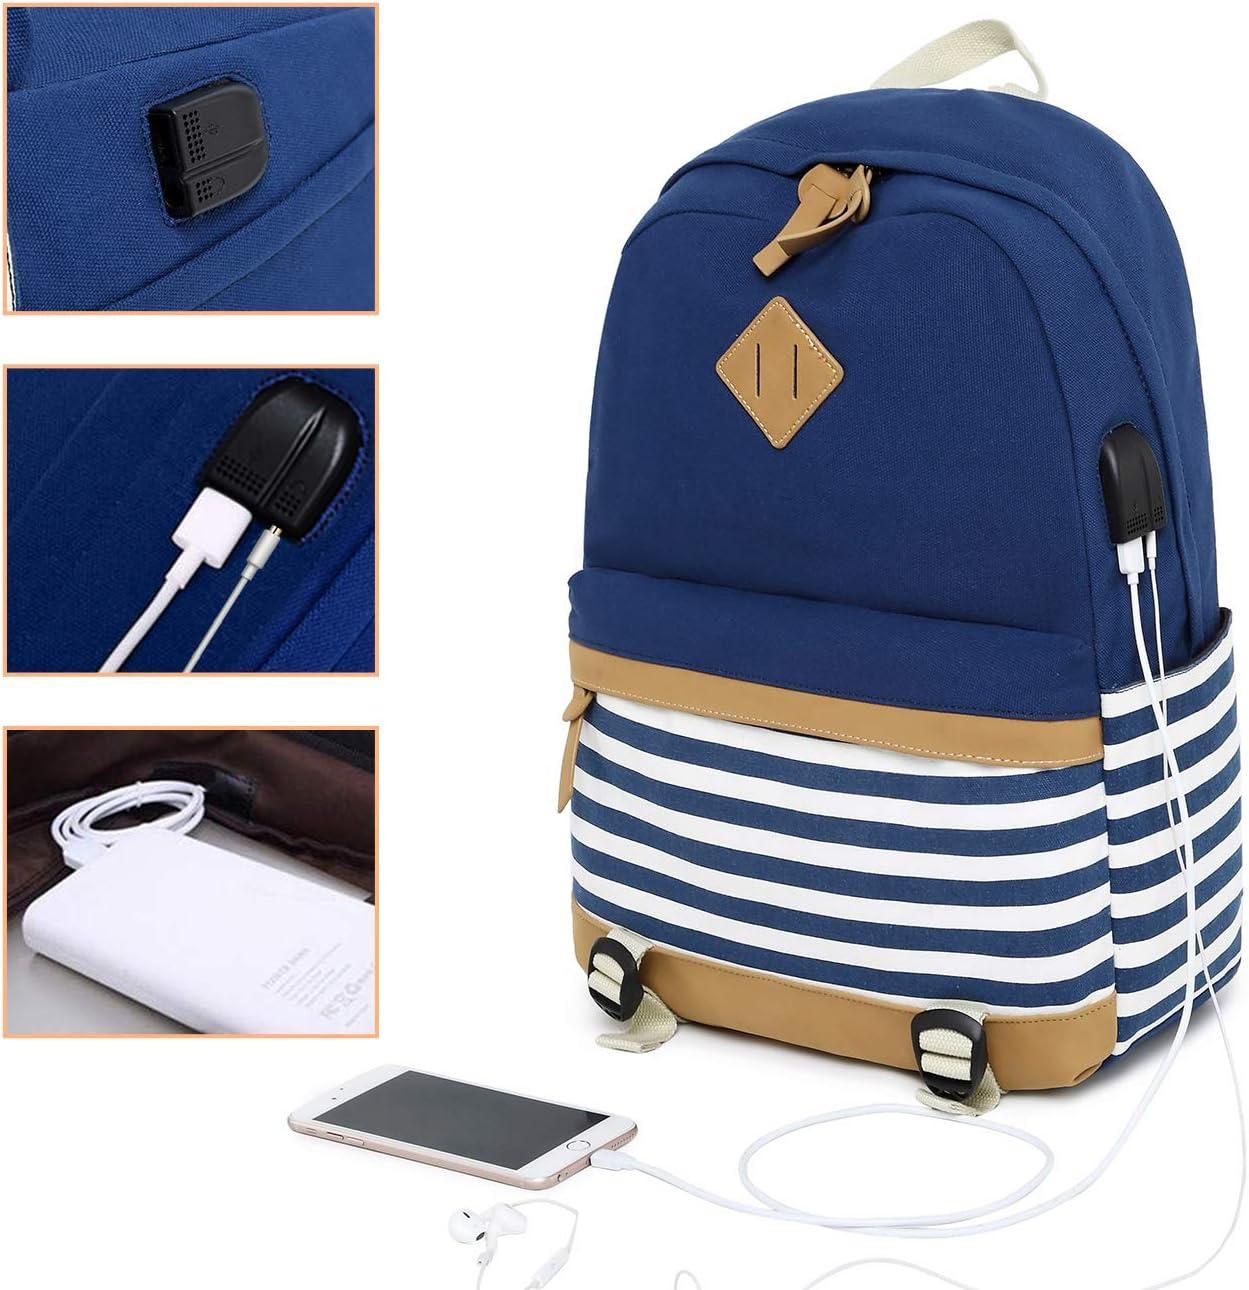 Mochila de Lona para Estudiante Mochila Universitaria Unisex Bolsa Trasera con Puerto de Carga USB Azul